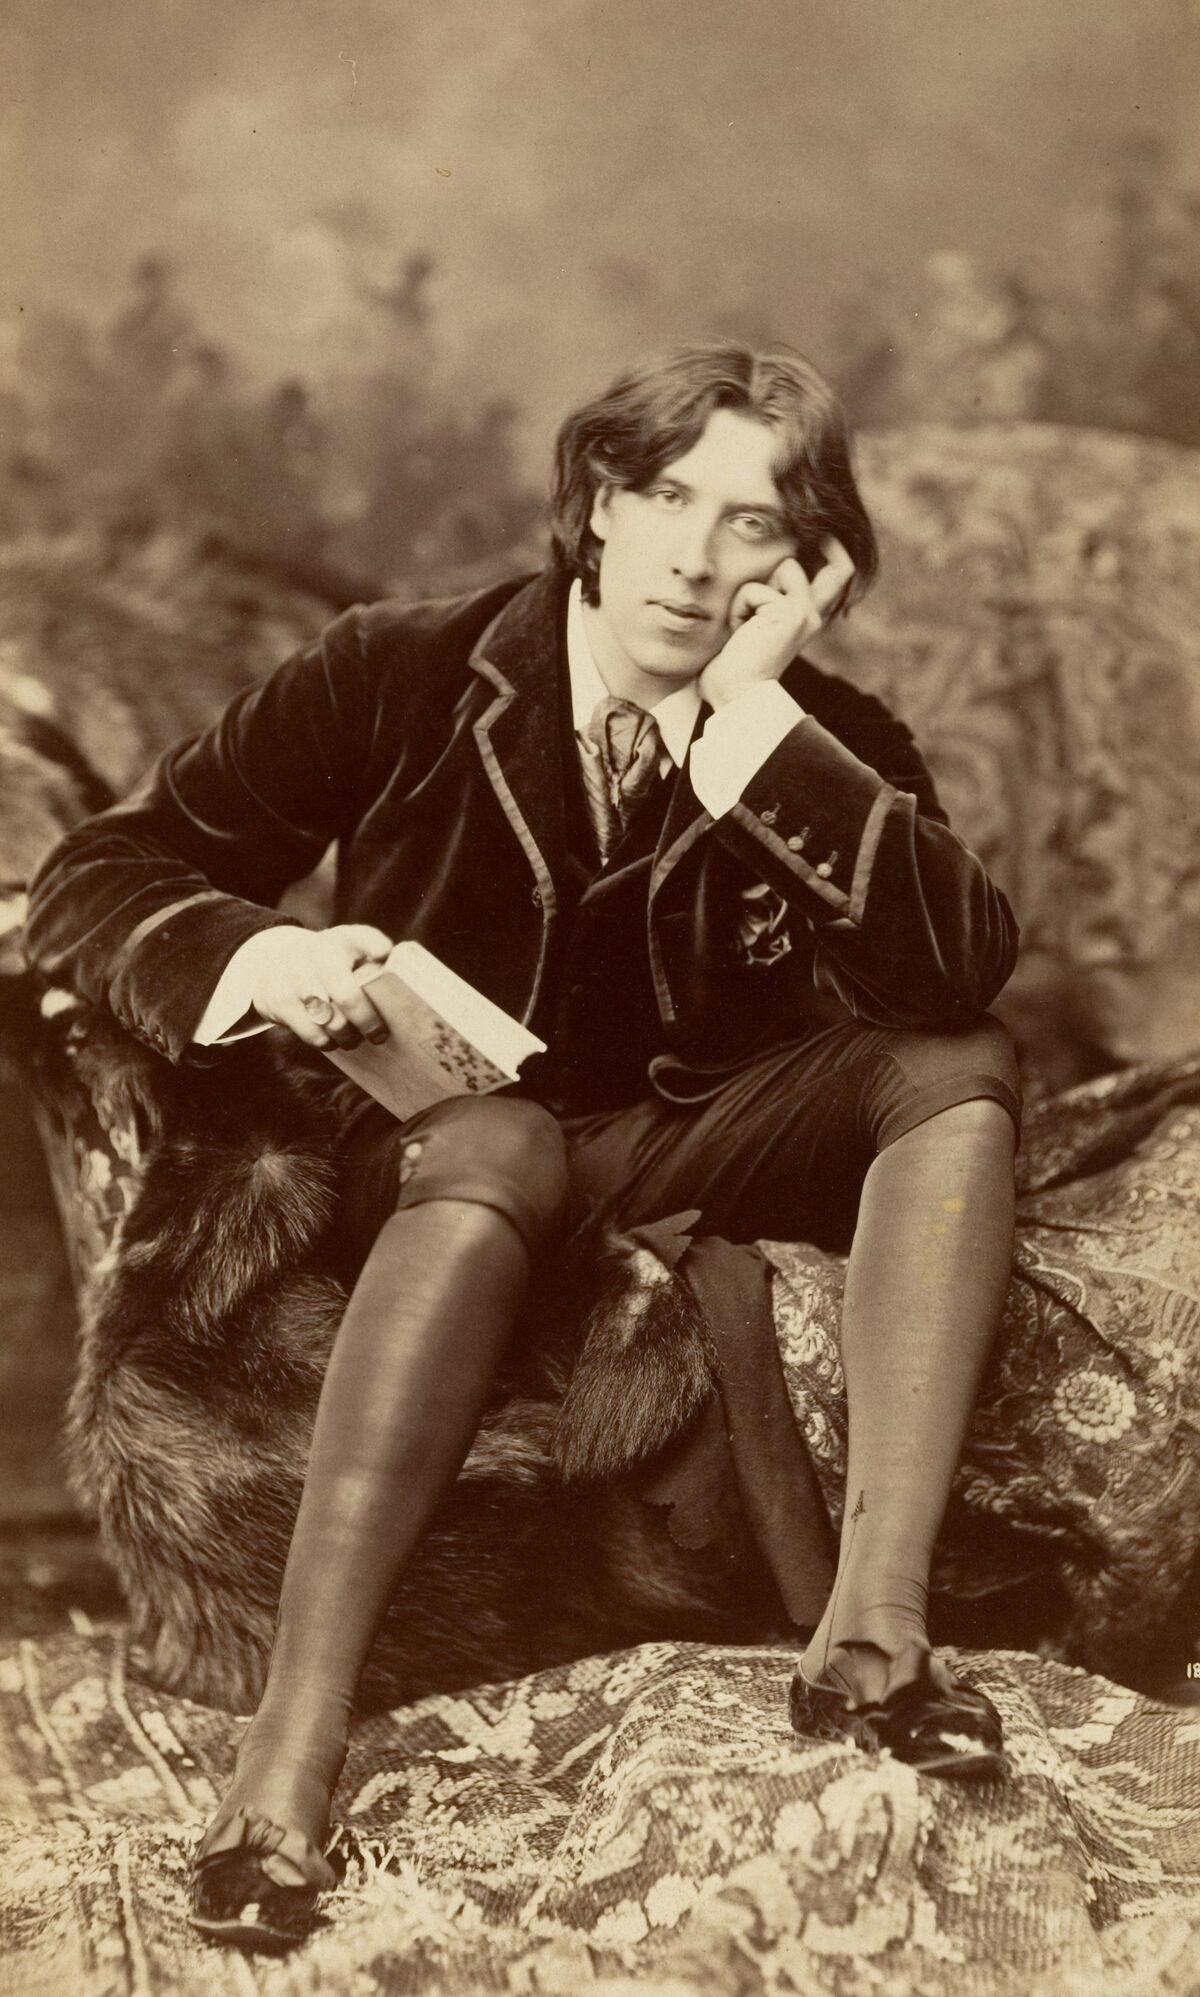 Napoleon Sarony, Oscar Wilde, 1882. Image via Wikimedia Commons.